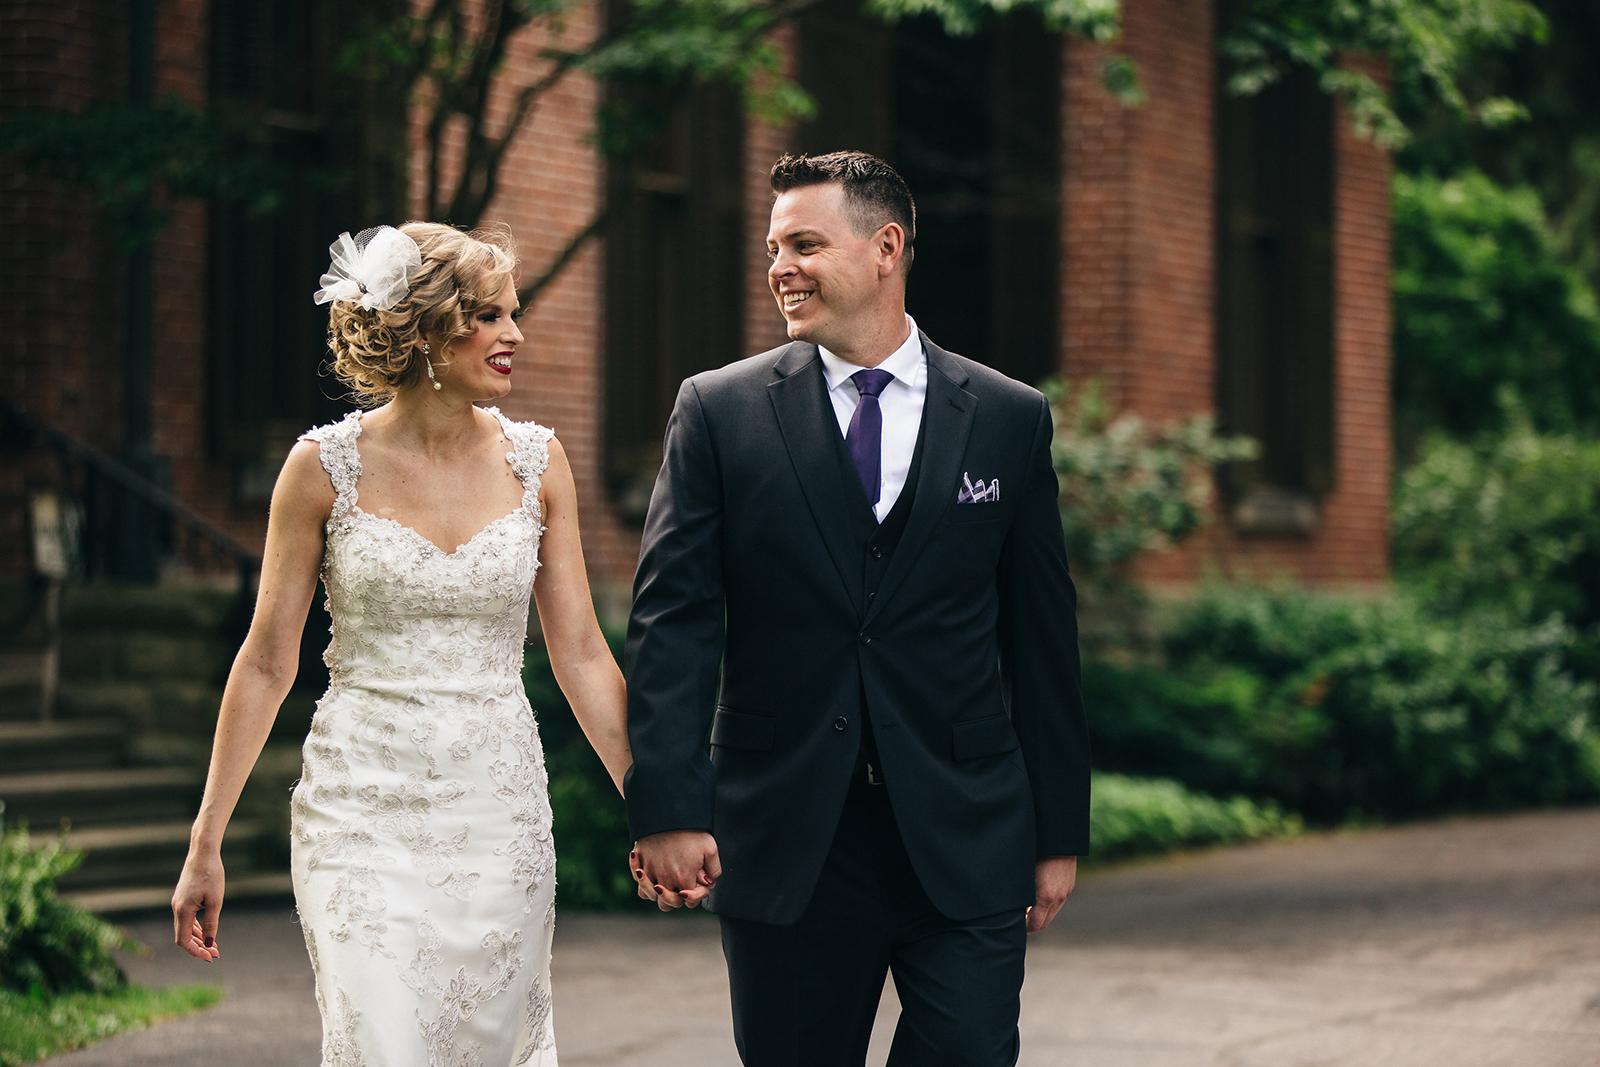 Bride and groom walking through a park on their wedding day in Sandusky, Ohio.